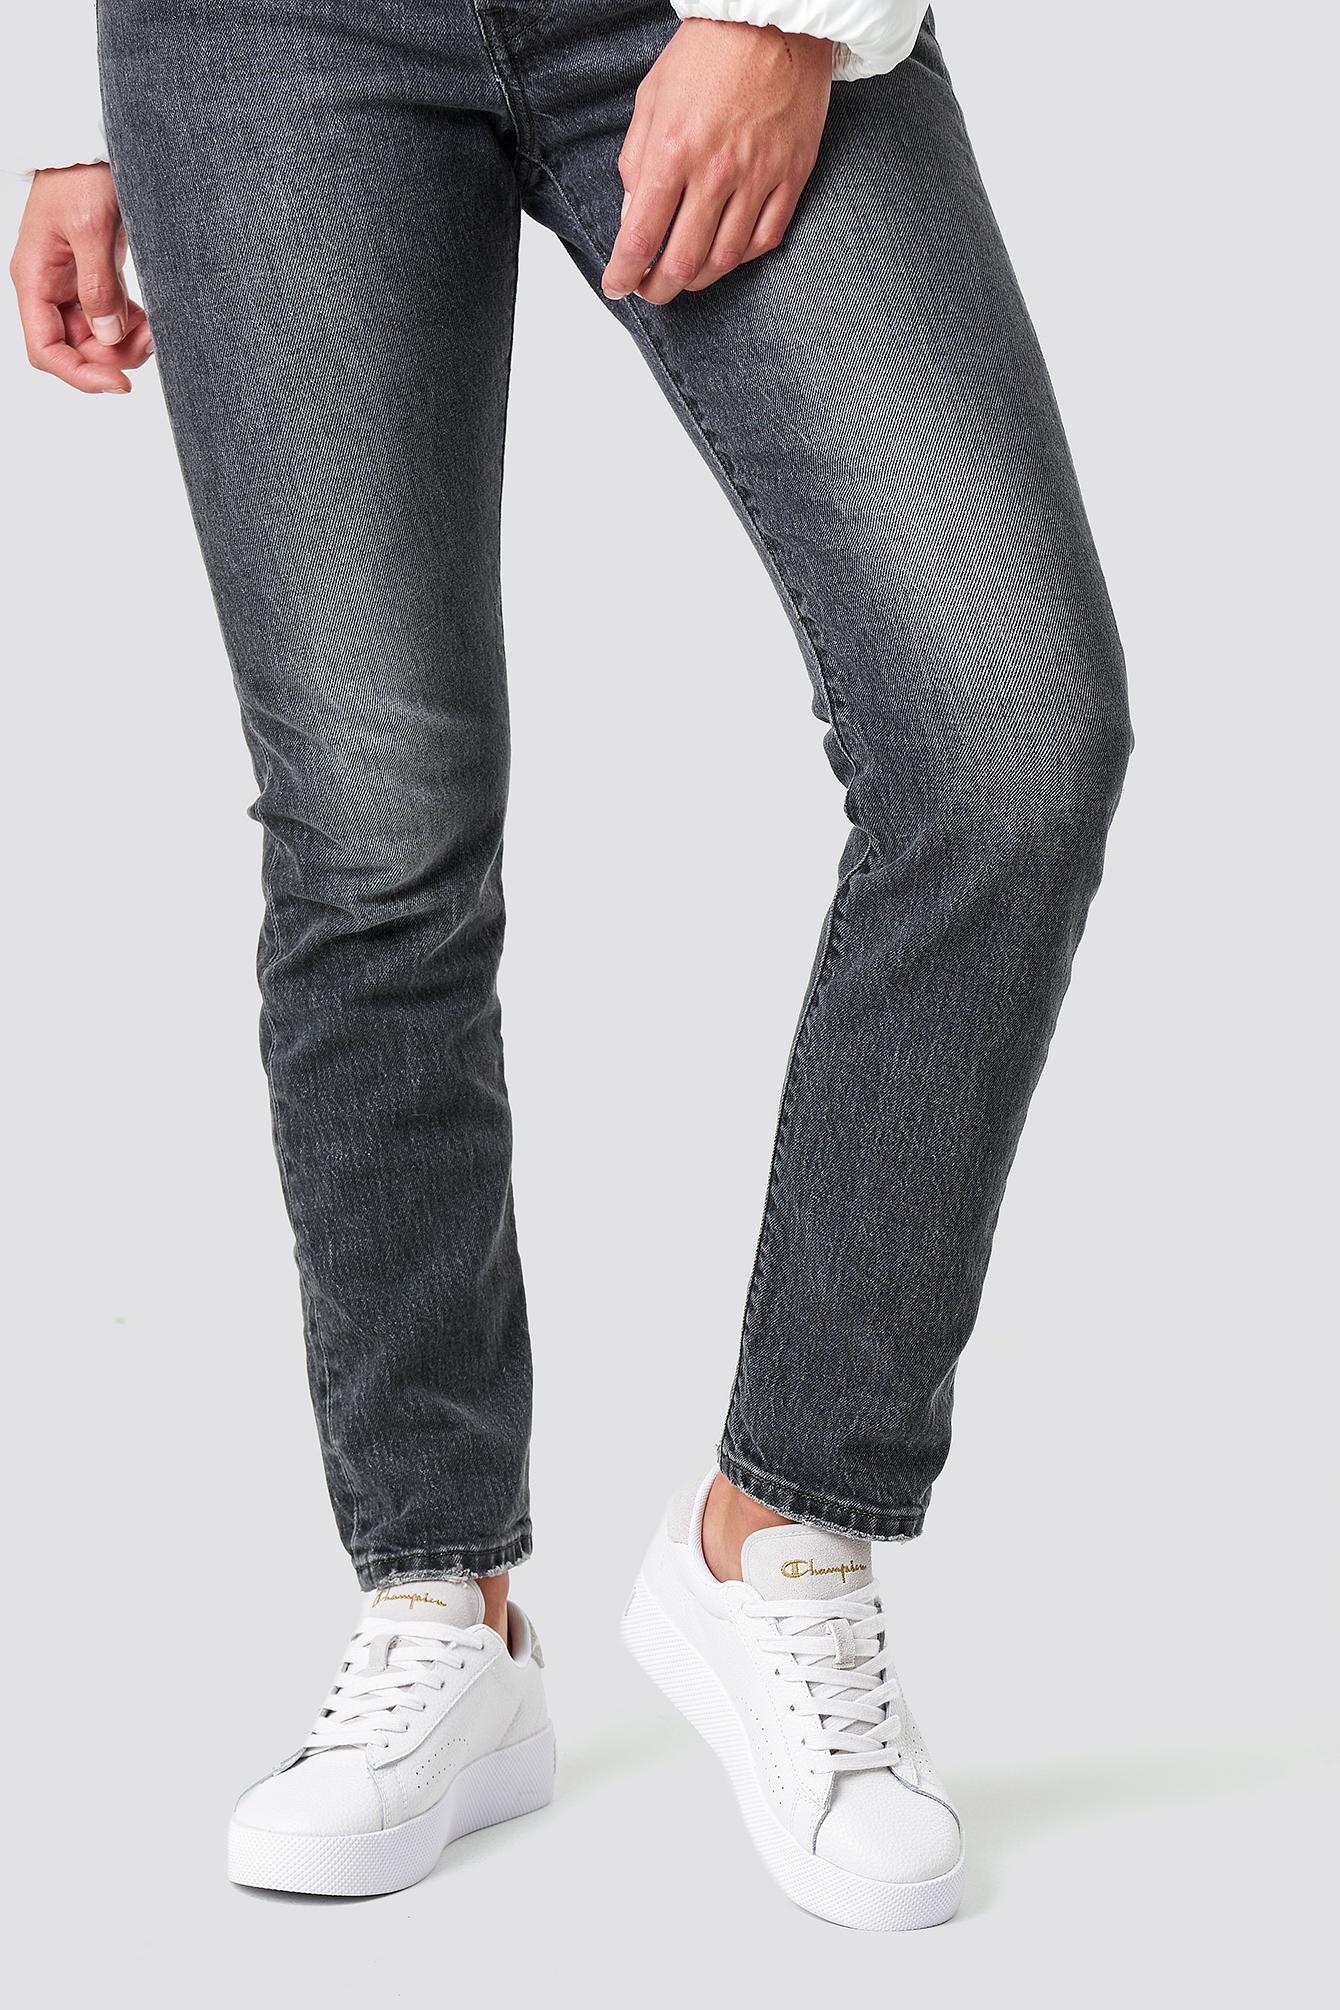 Era Leather Sneaker S10535 NA-KD.COM